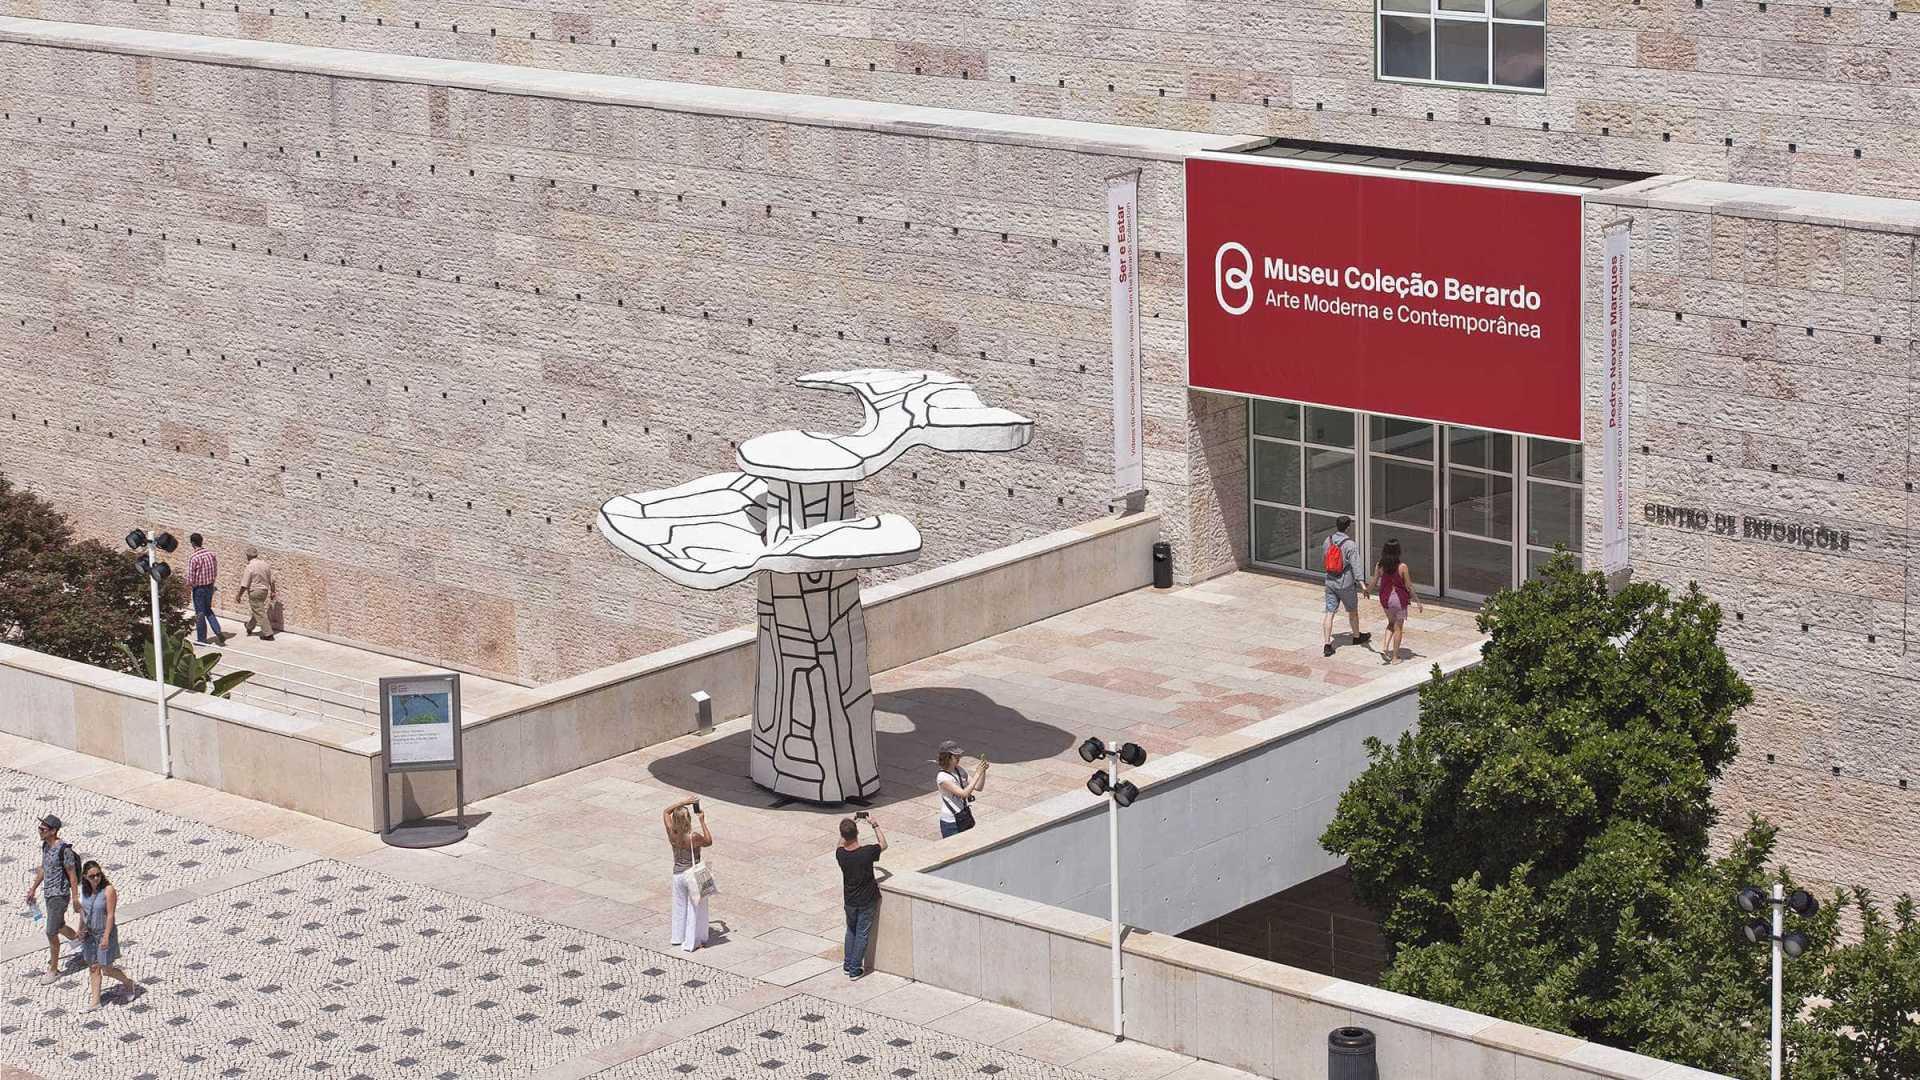 Studietur Lissabon Berardo